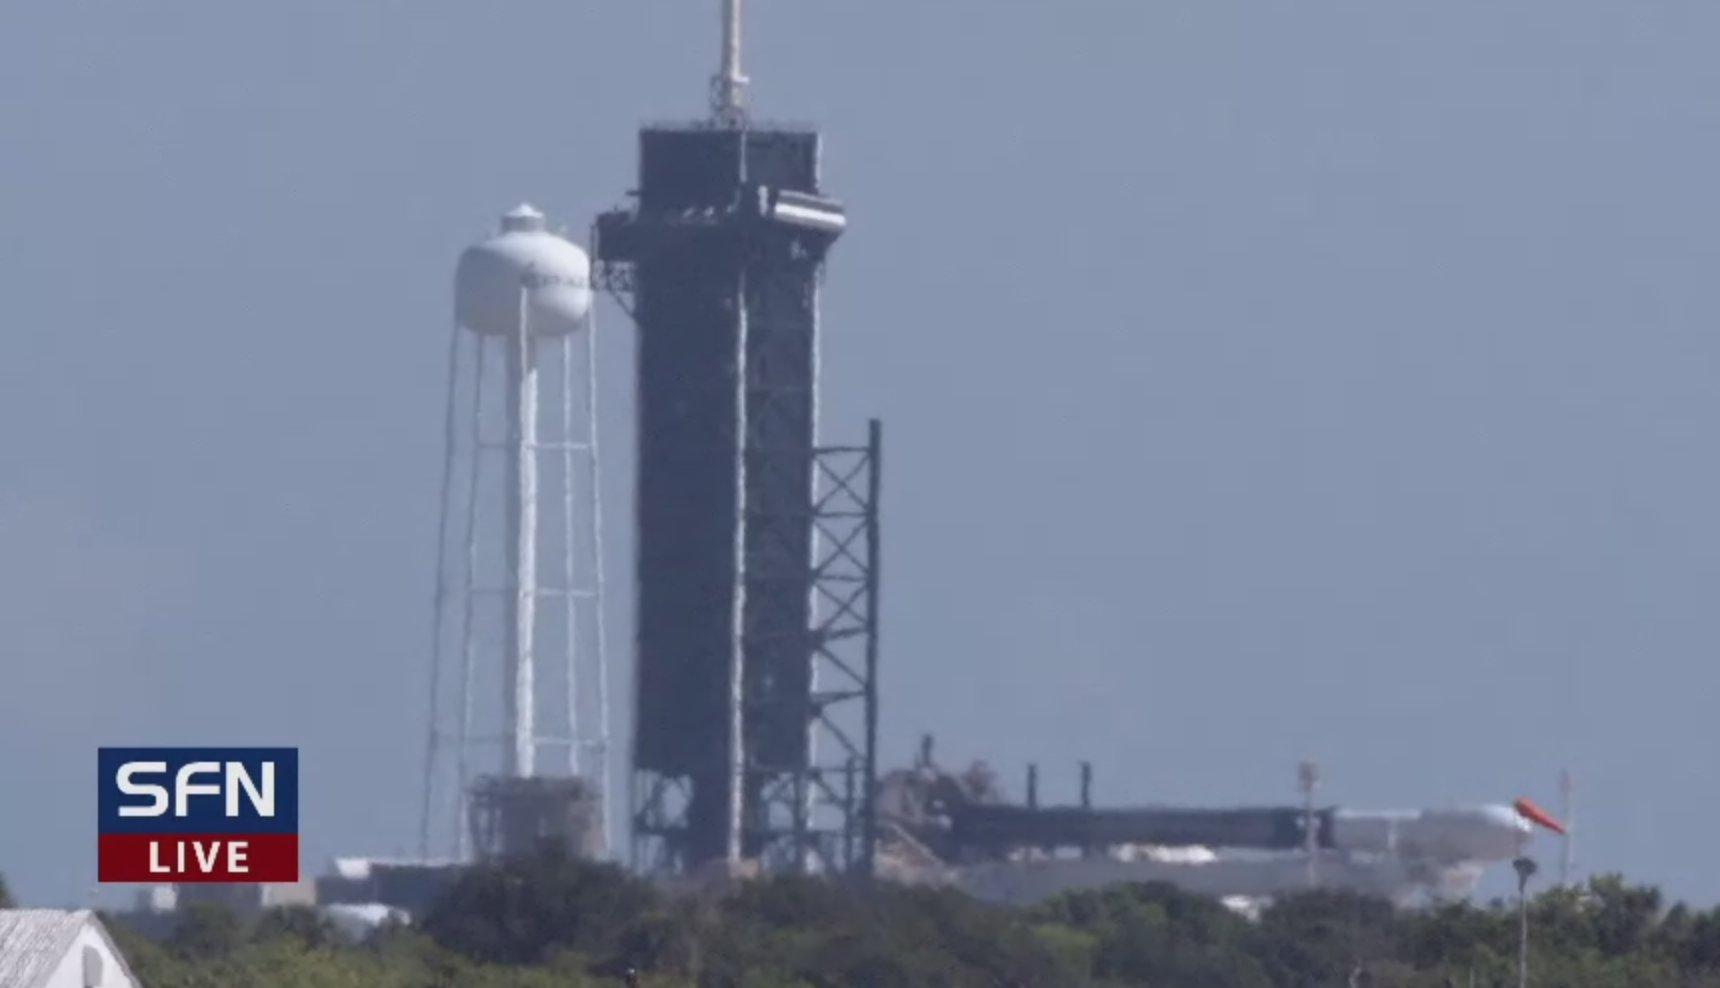 Falcon 9 (Starlink v1.0 L13) - KSC - 18.10.2020 [succès] 11517